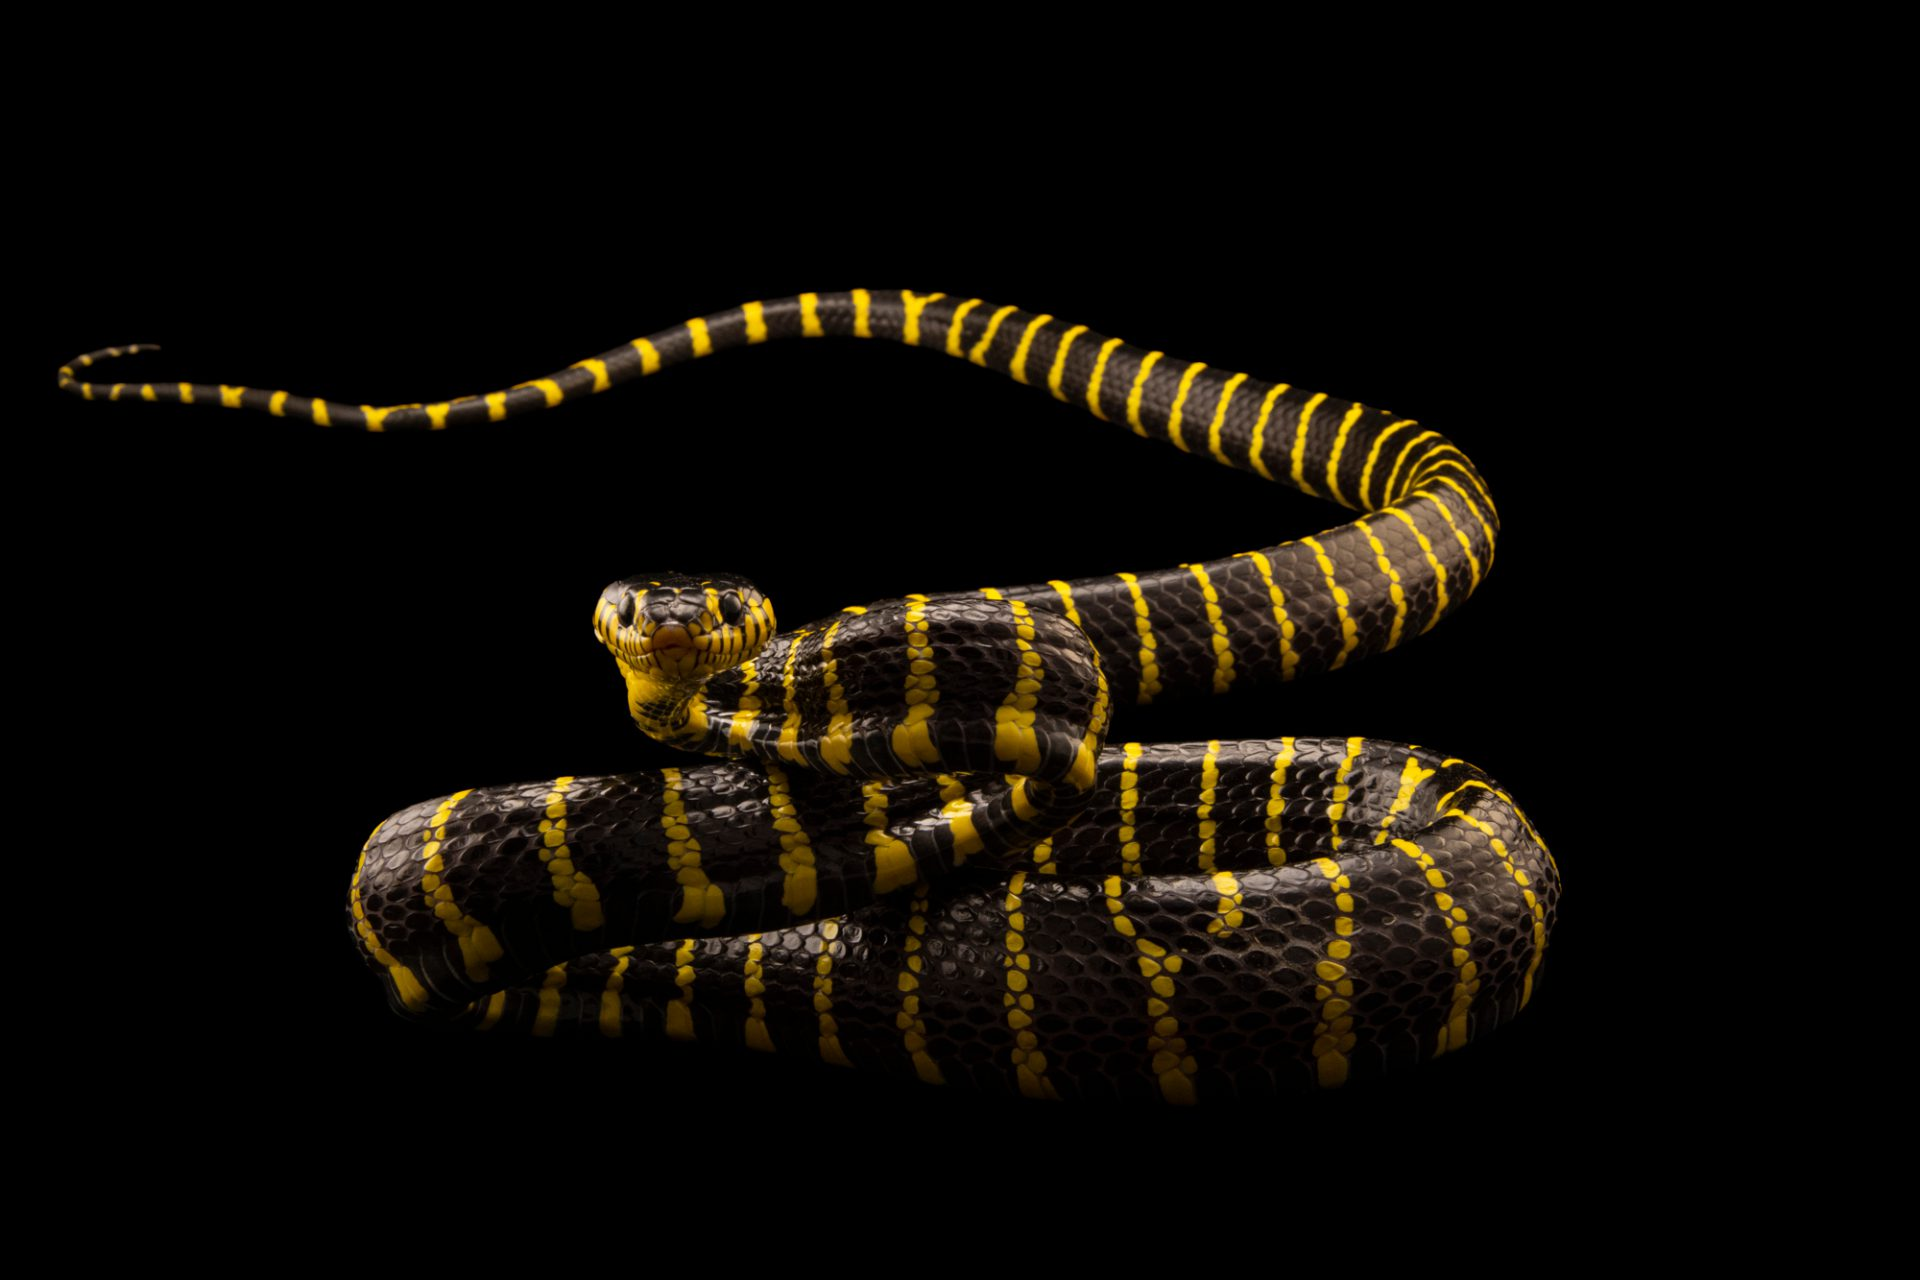 Photo: A Philippine mangrove snake (Boiga dendrophila multicincta) at the Avilon Zoo.